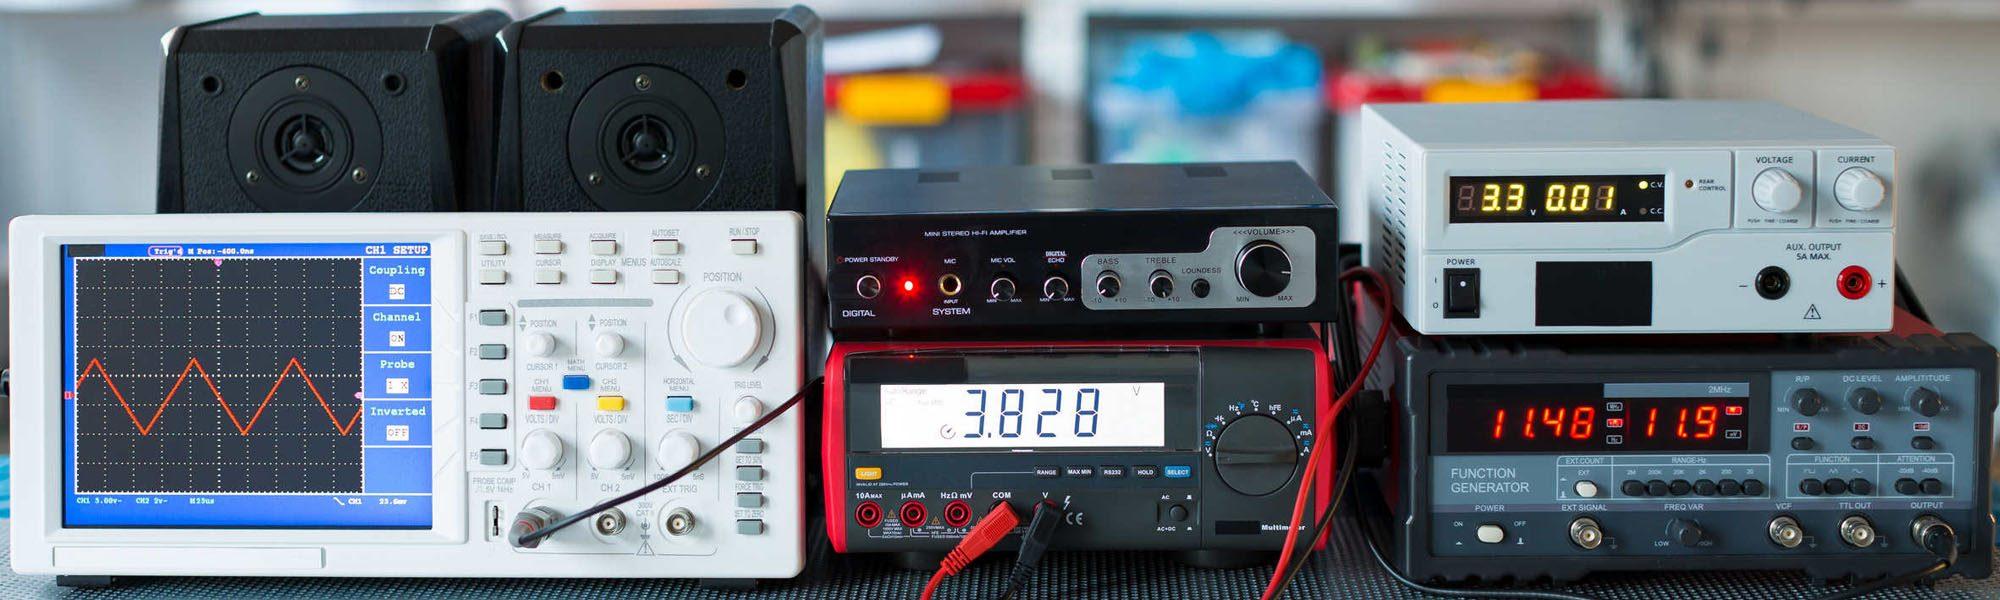 GMDSS Radio Operator/Maintainer License